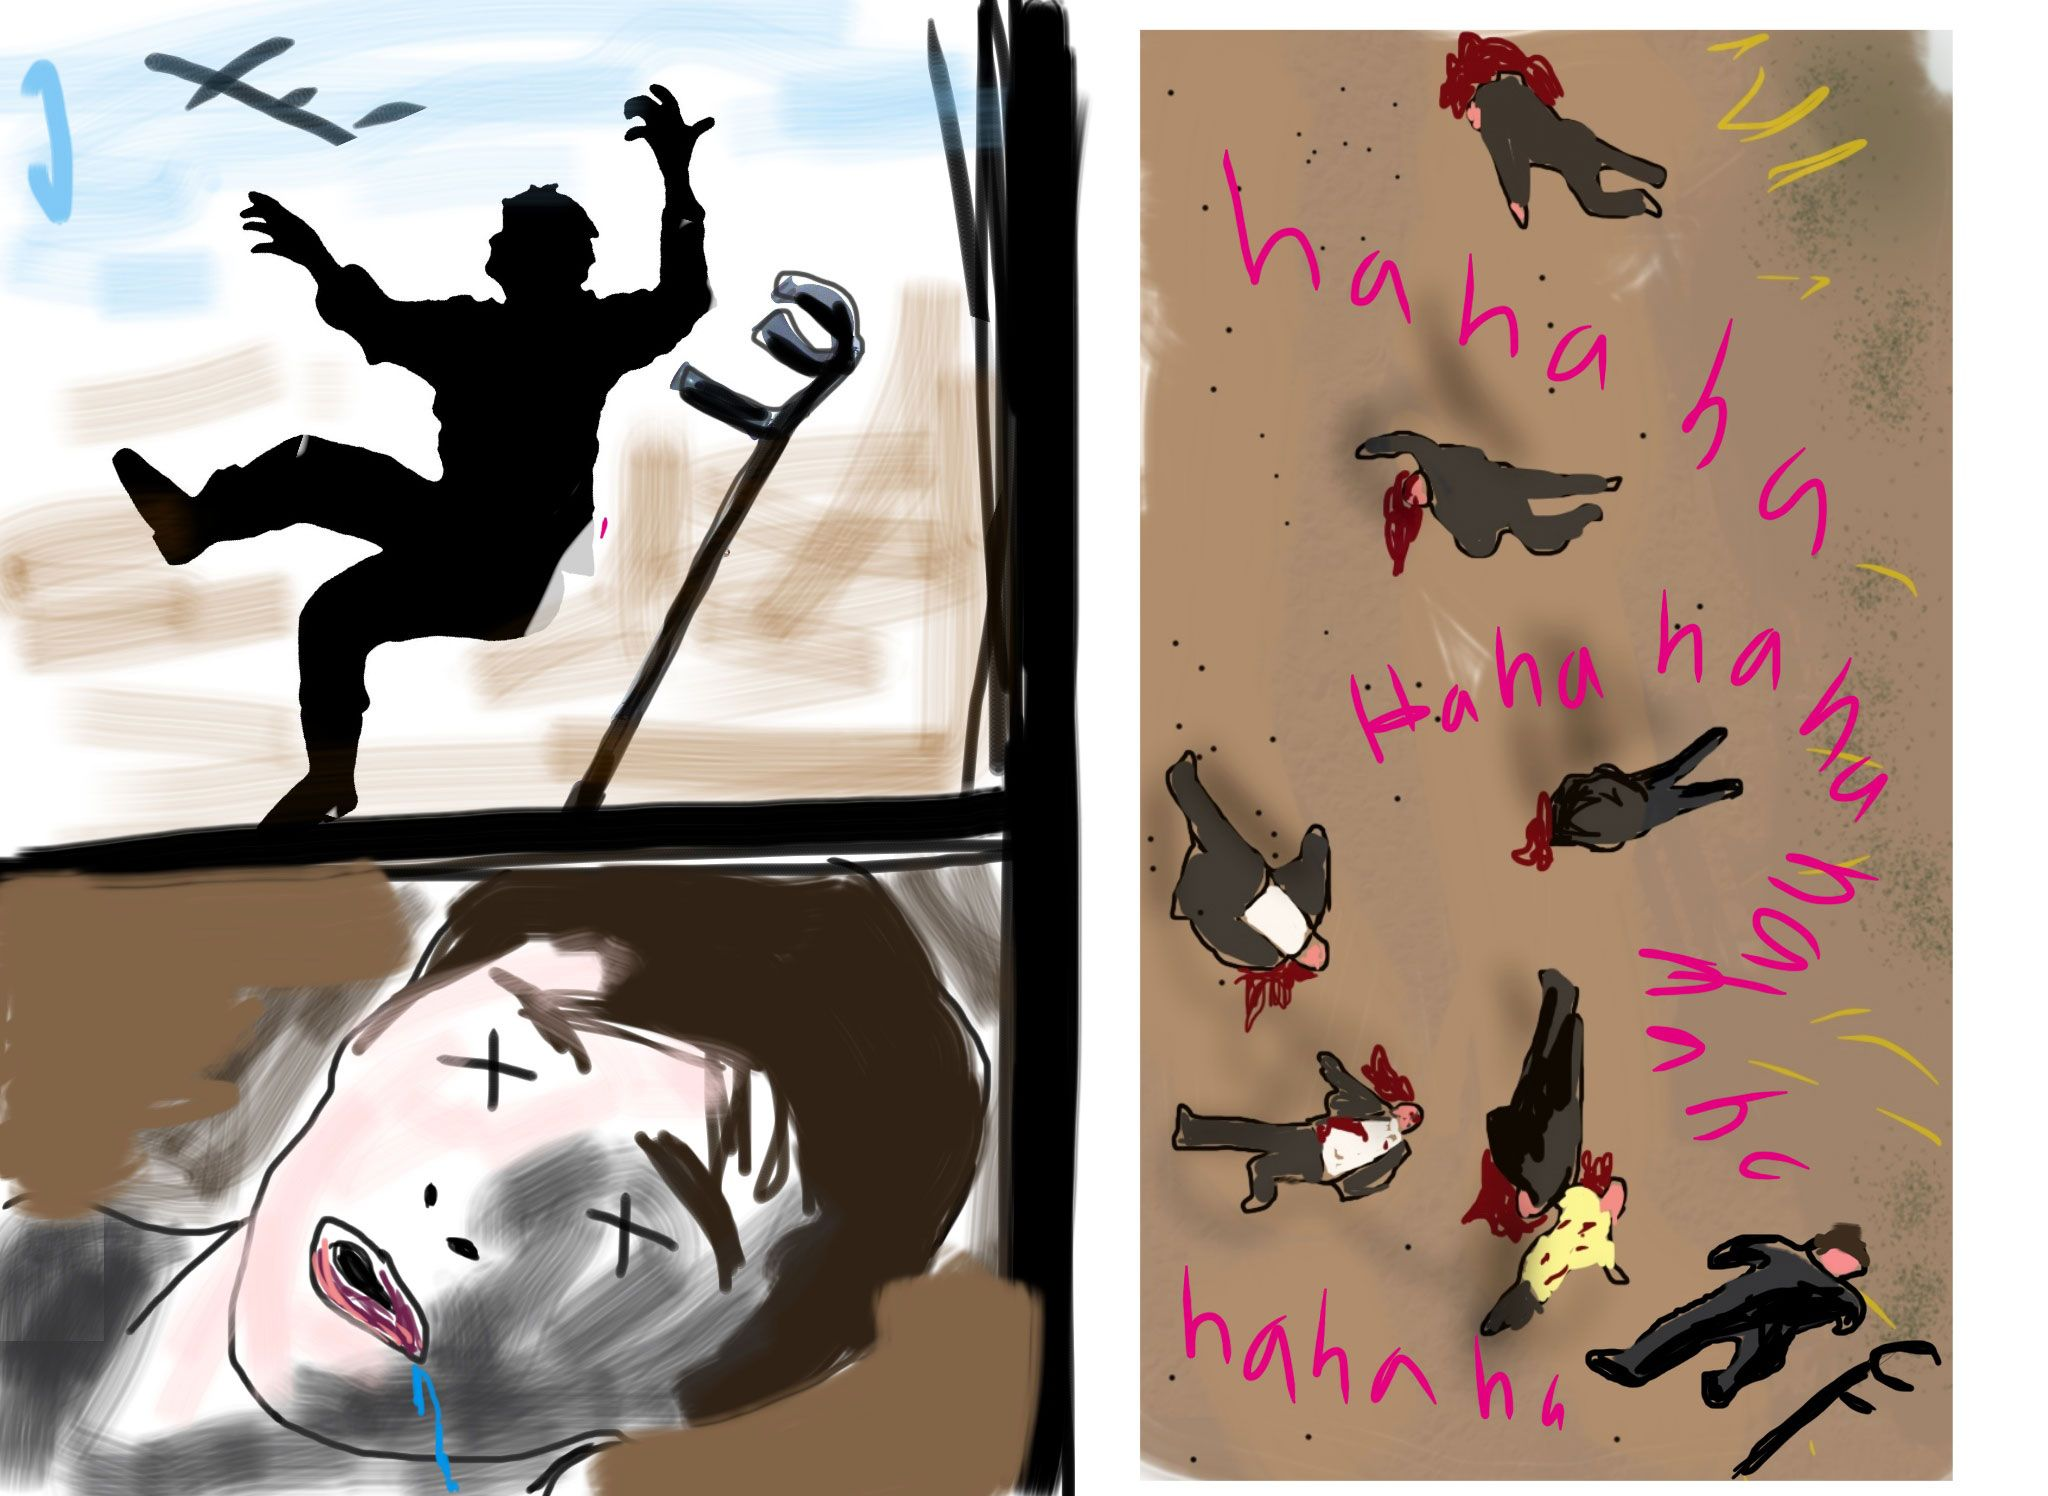 Breaking Bad Comic 4 - netw3rk/Grantland